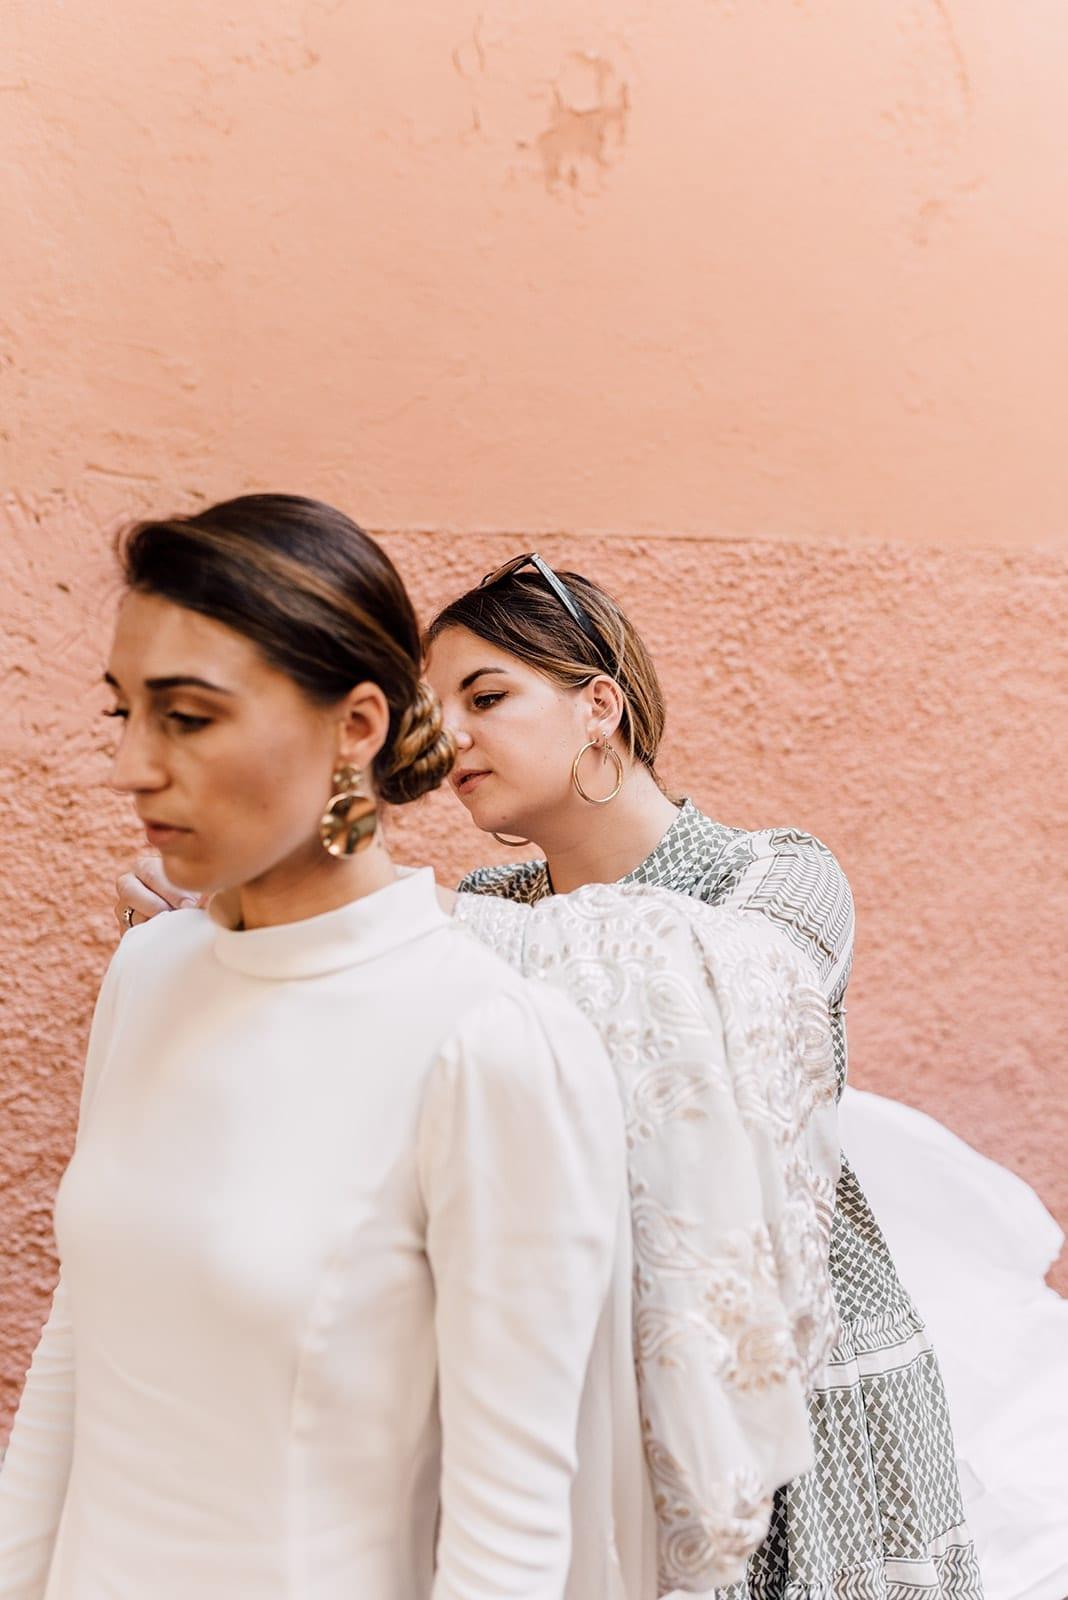 Marrakech wedding planner marriage morocco trouwen bruiloft